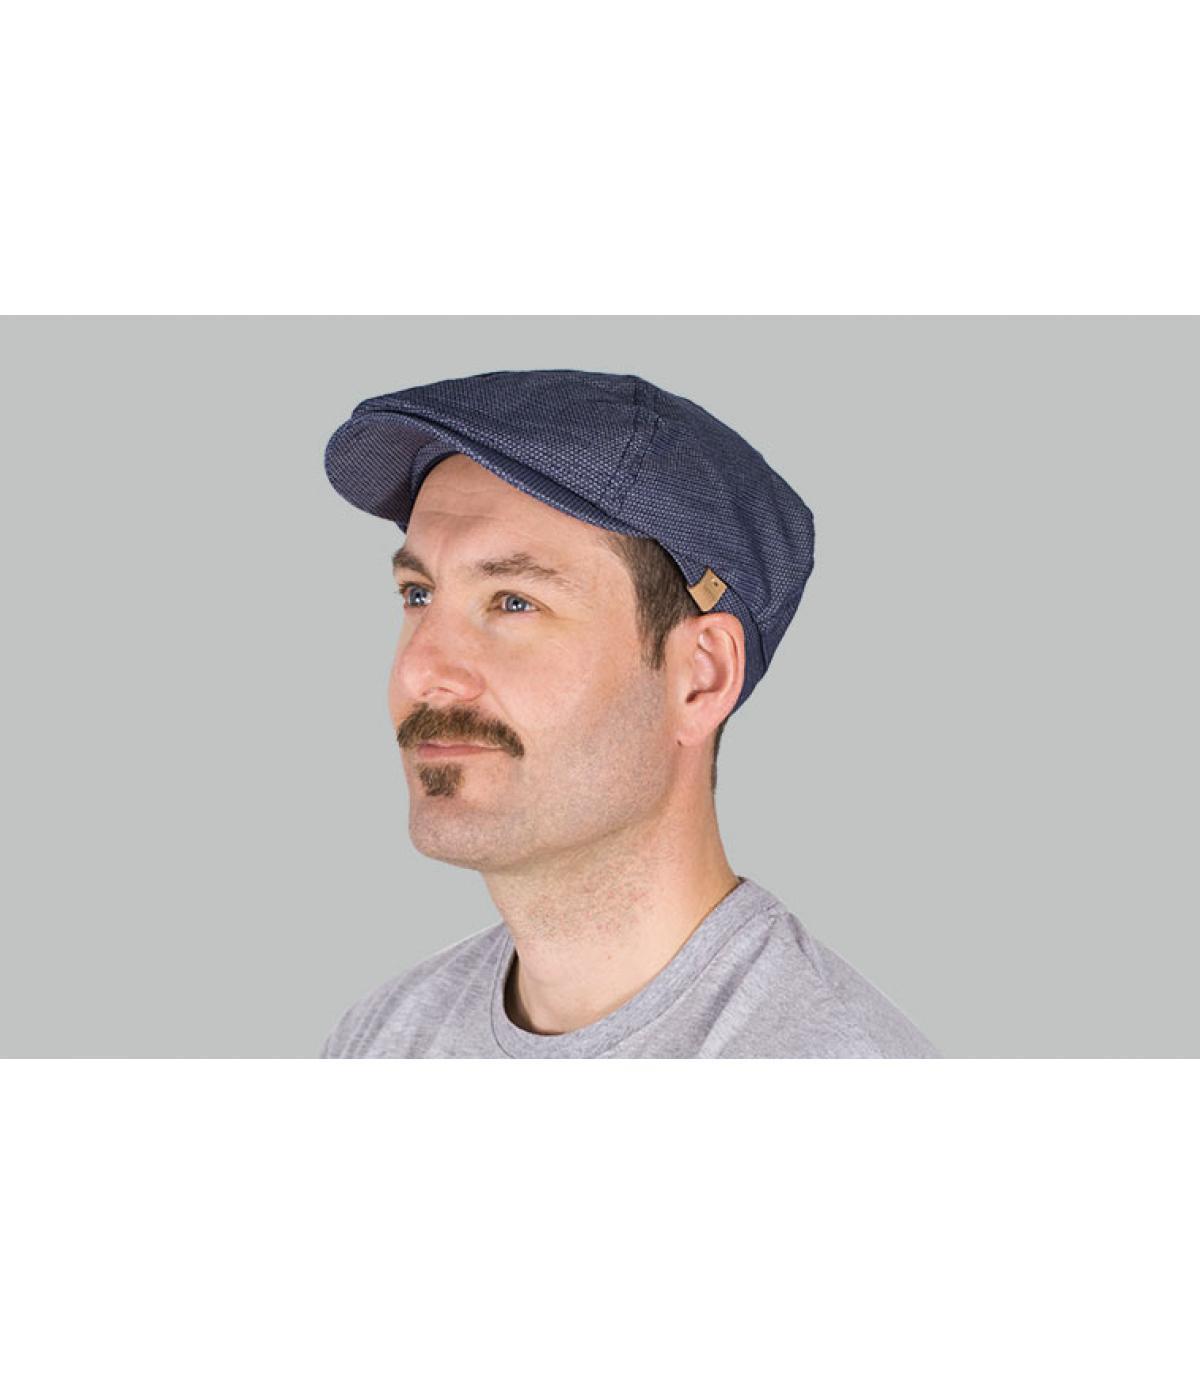 gorra repartidor azul estampado